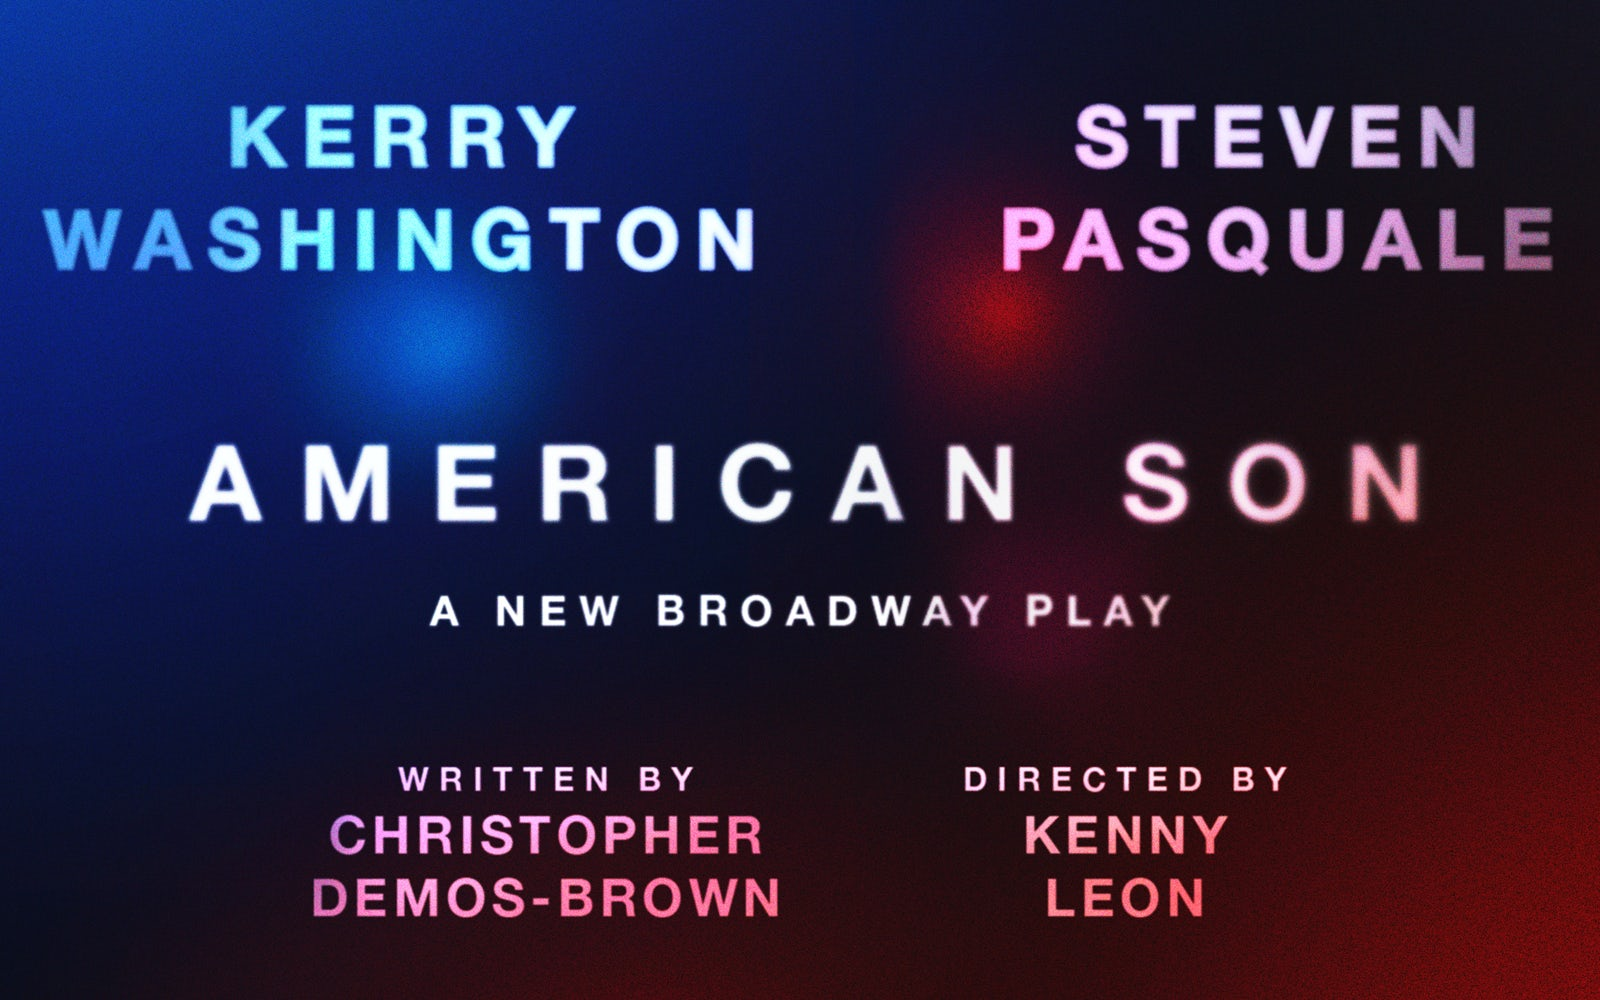 Upcoming broadway shows 2018